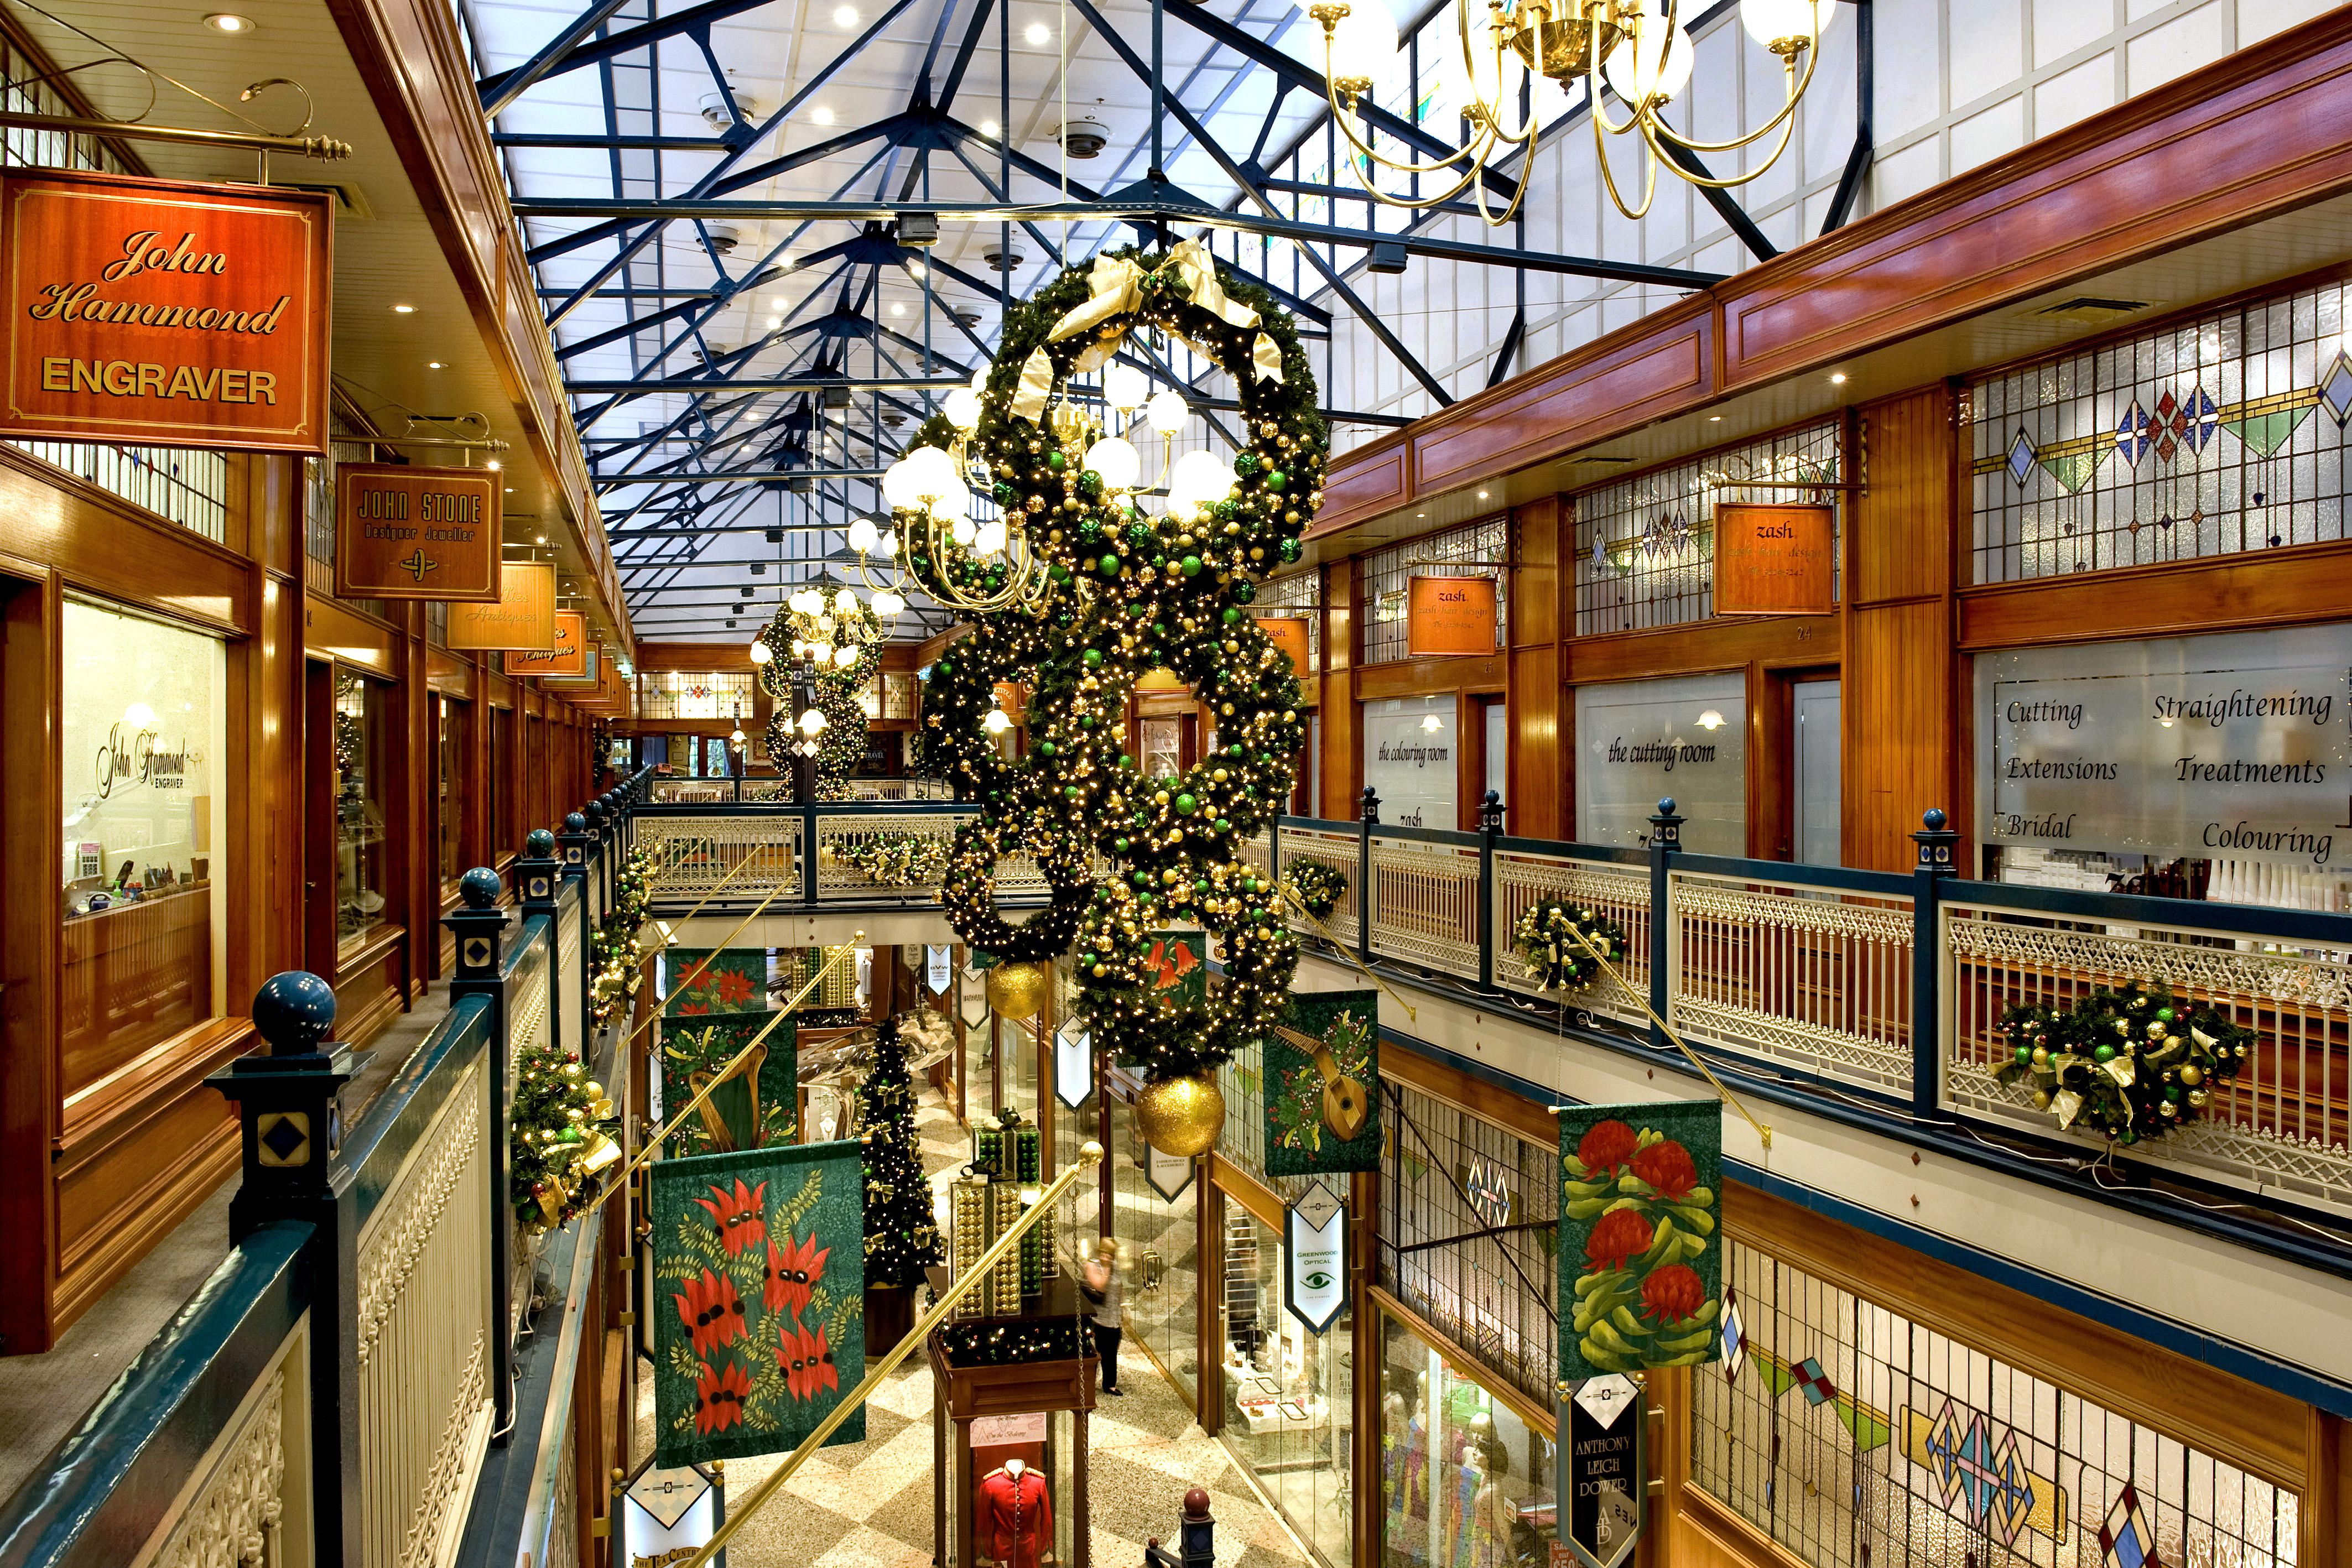 Christmas decorations in Brisbane Arcade 2011